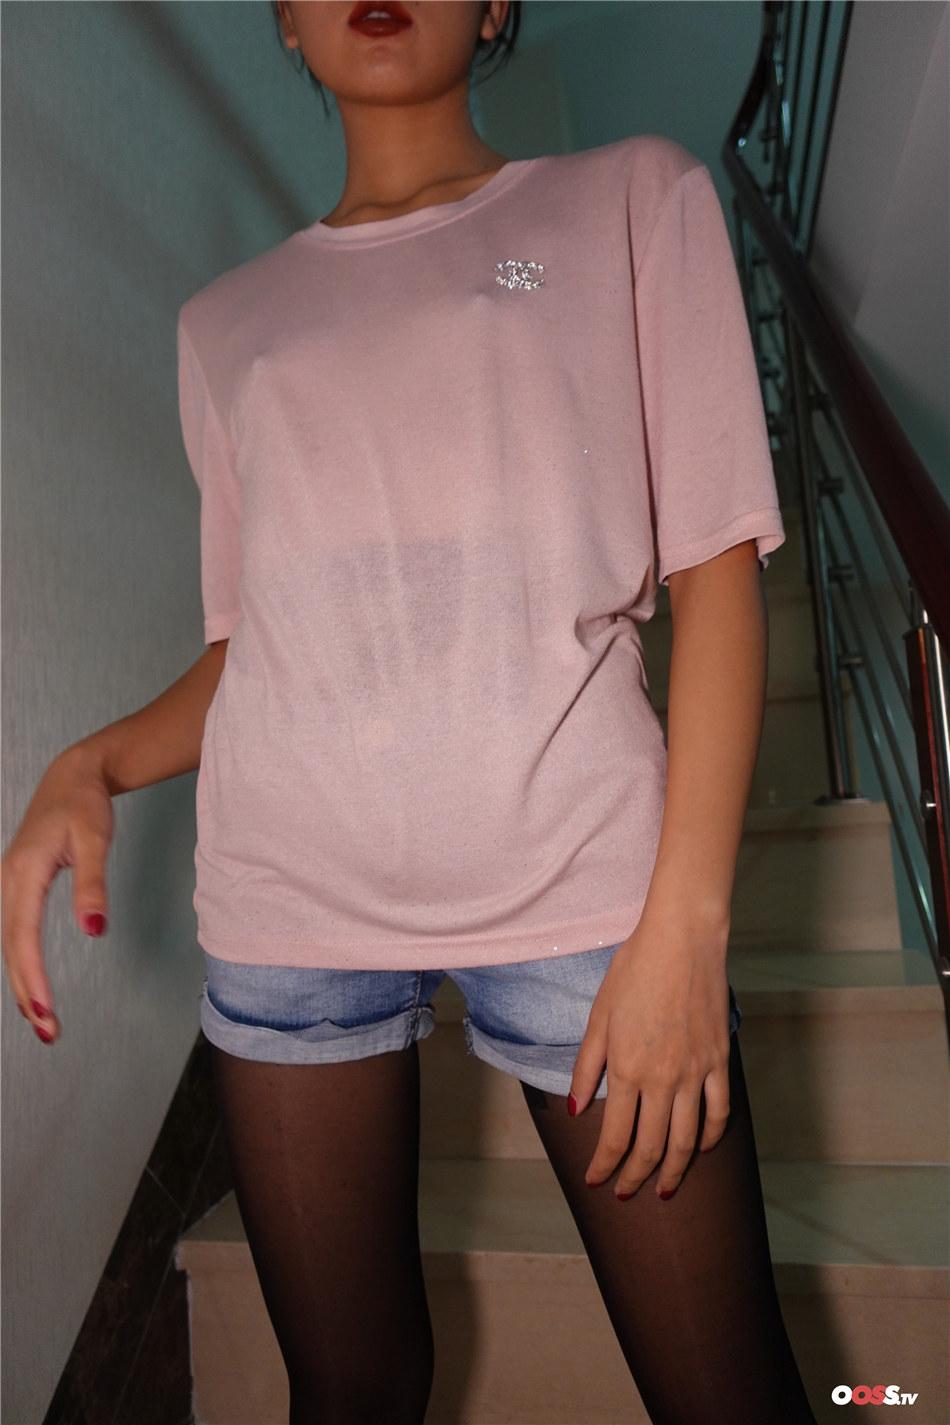 ROSI写真  风骚少妇透视装无内酥胸美腿诱惑大胆写真  NO.2255